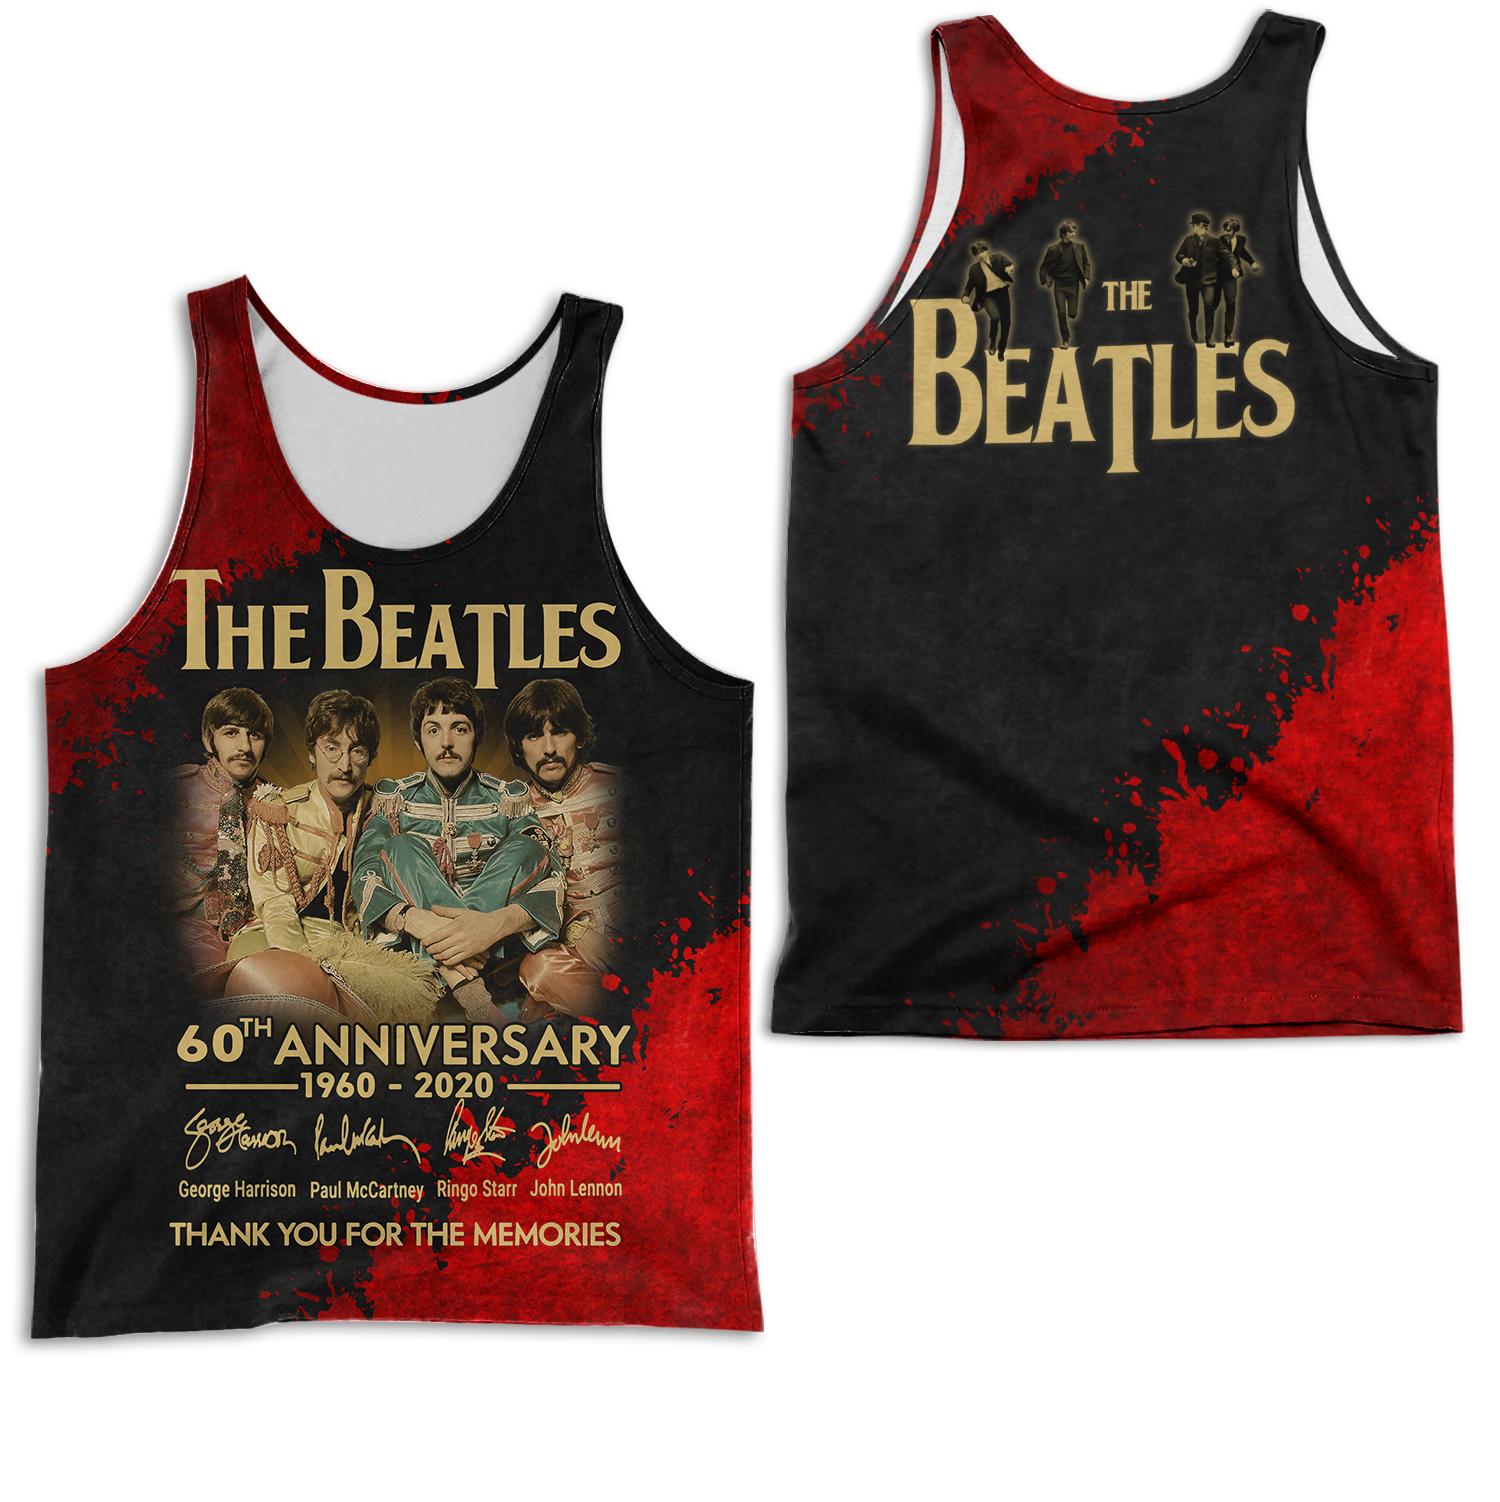 The beatles 60th anniversary 1960-2020 full printing tank top